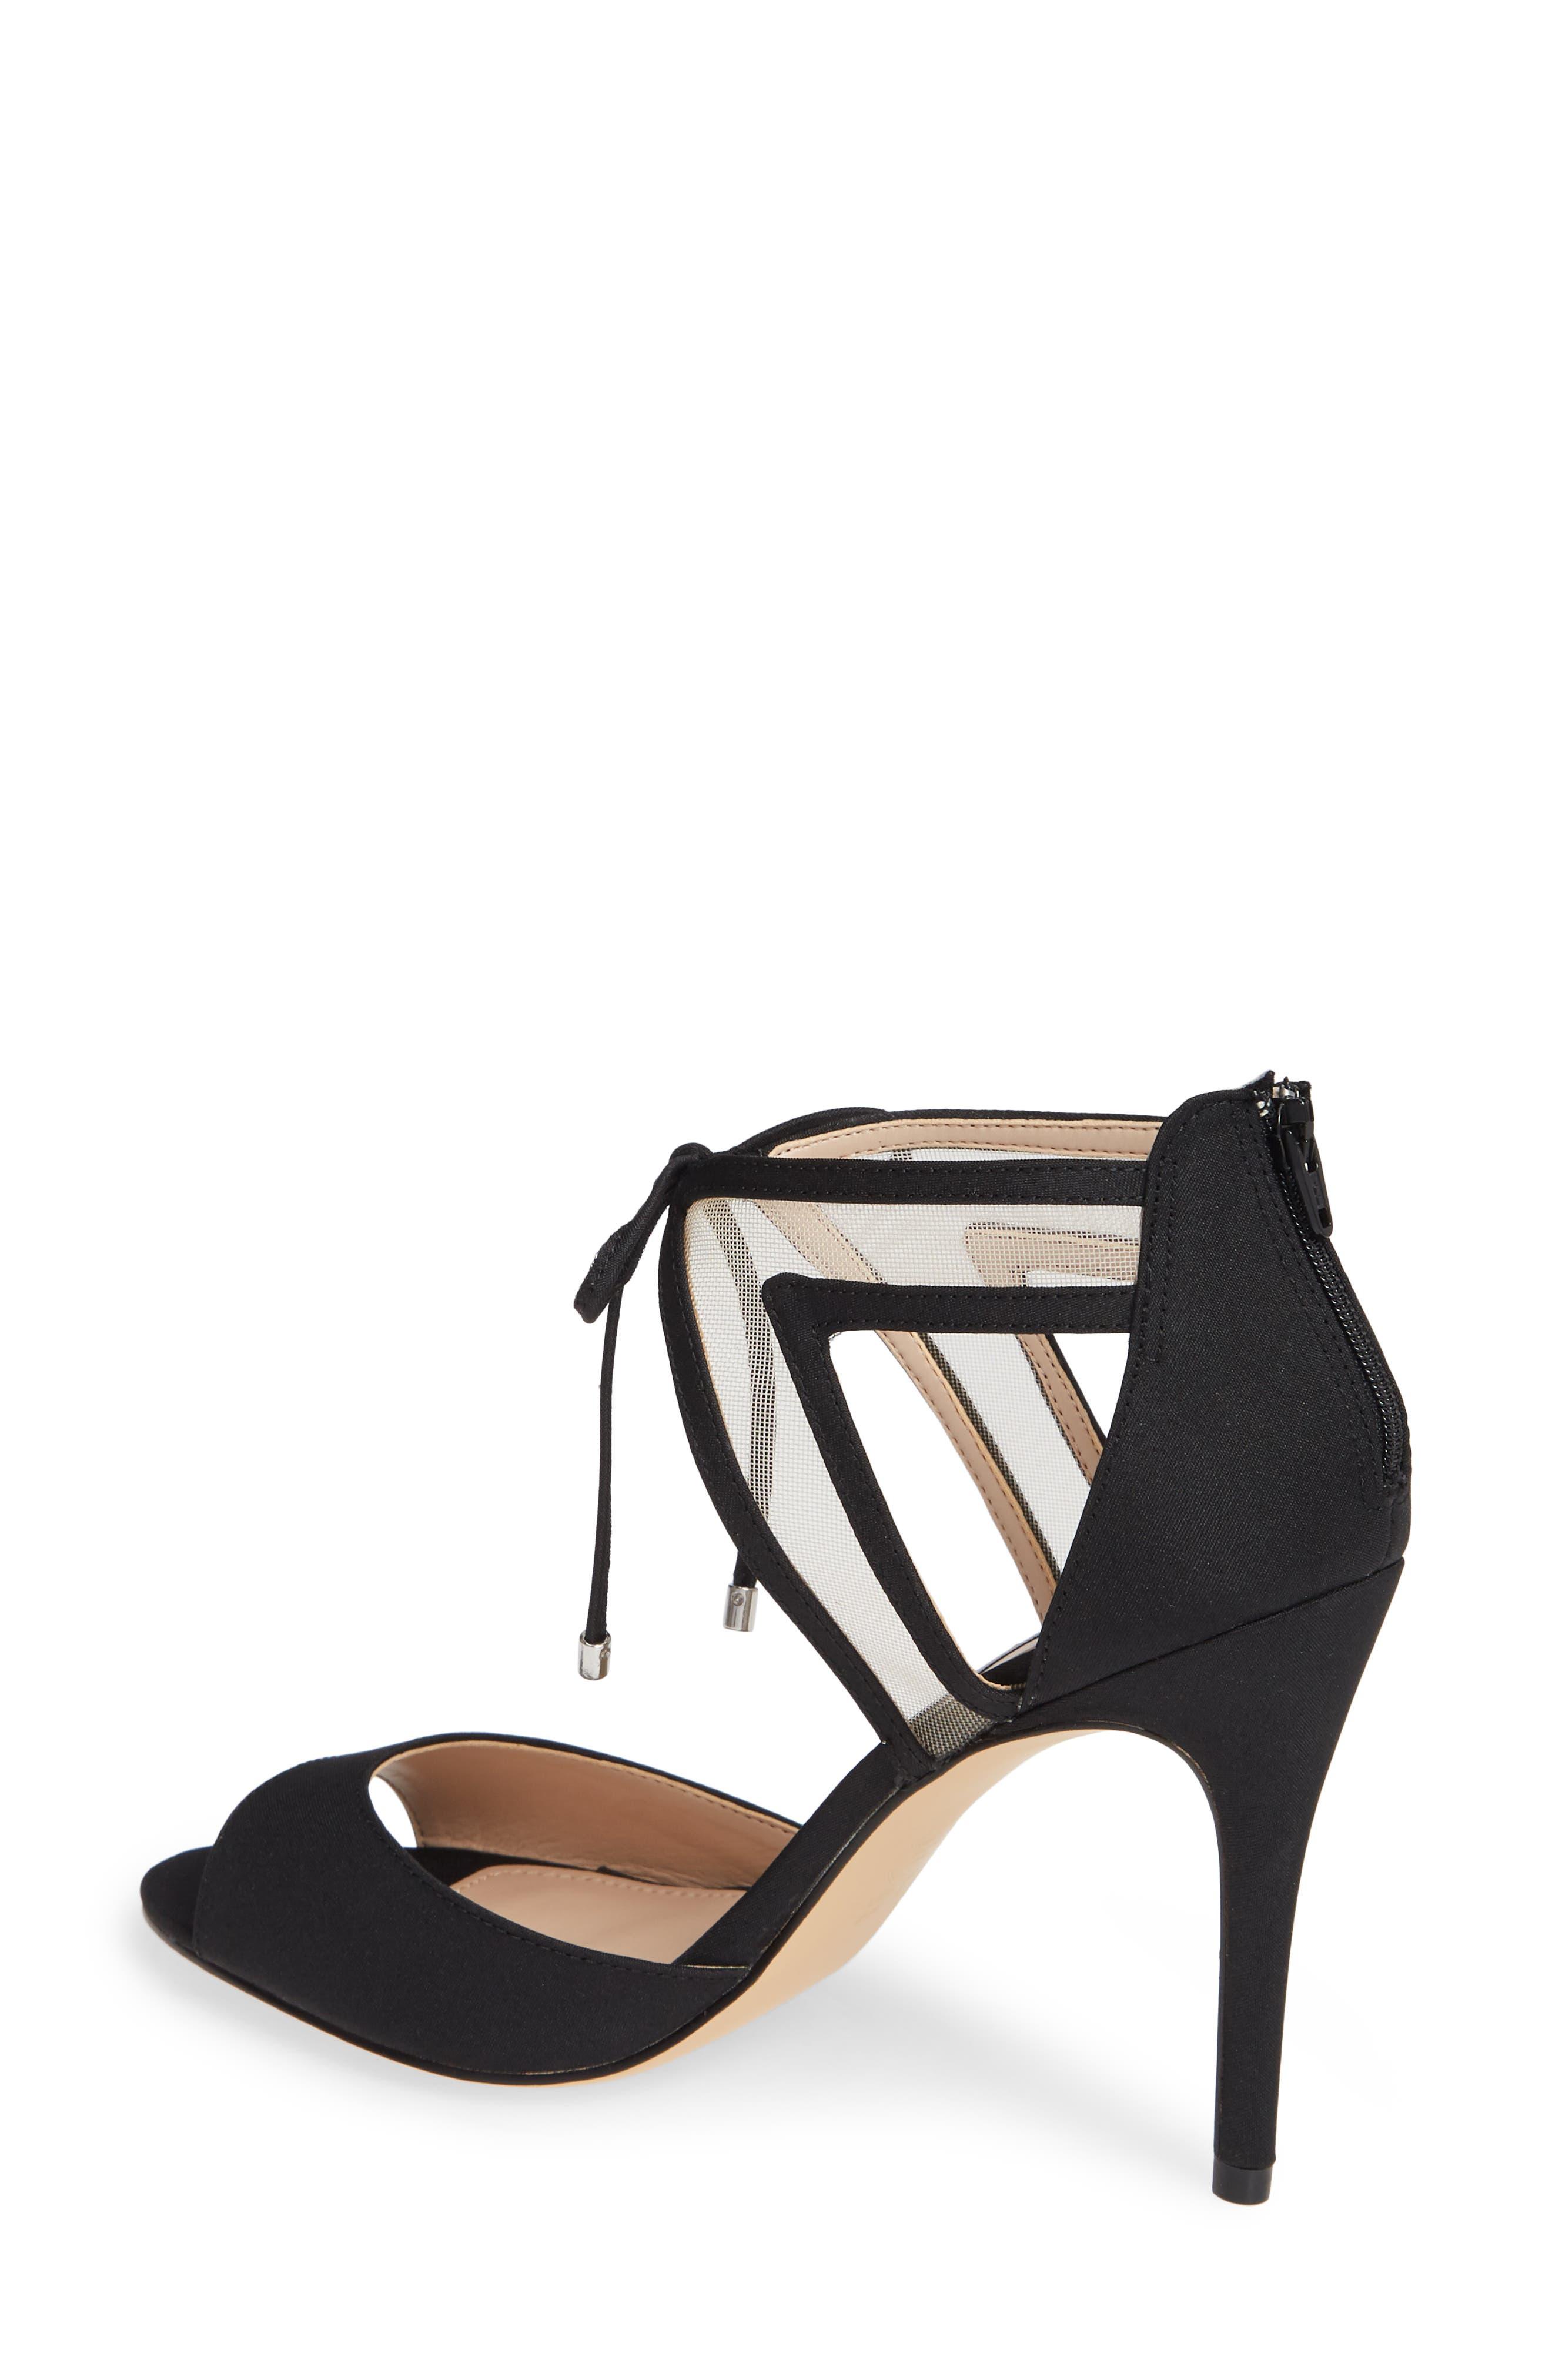 NINA, Caleya Ankle Tie Sandal, Alternate thumbnail 2, color, BLACK CHAMPAGNE